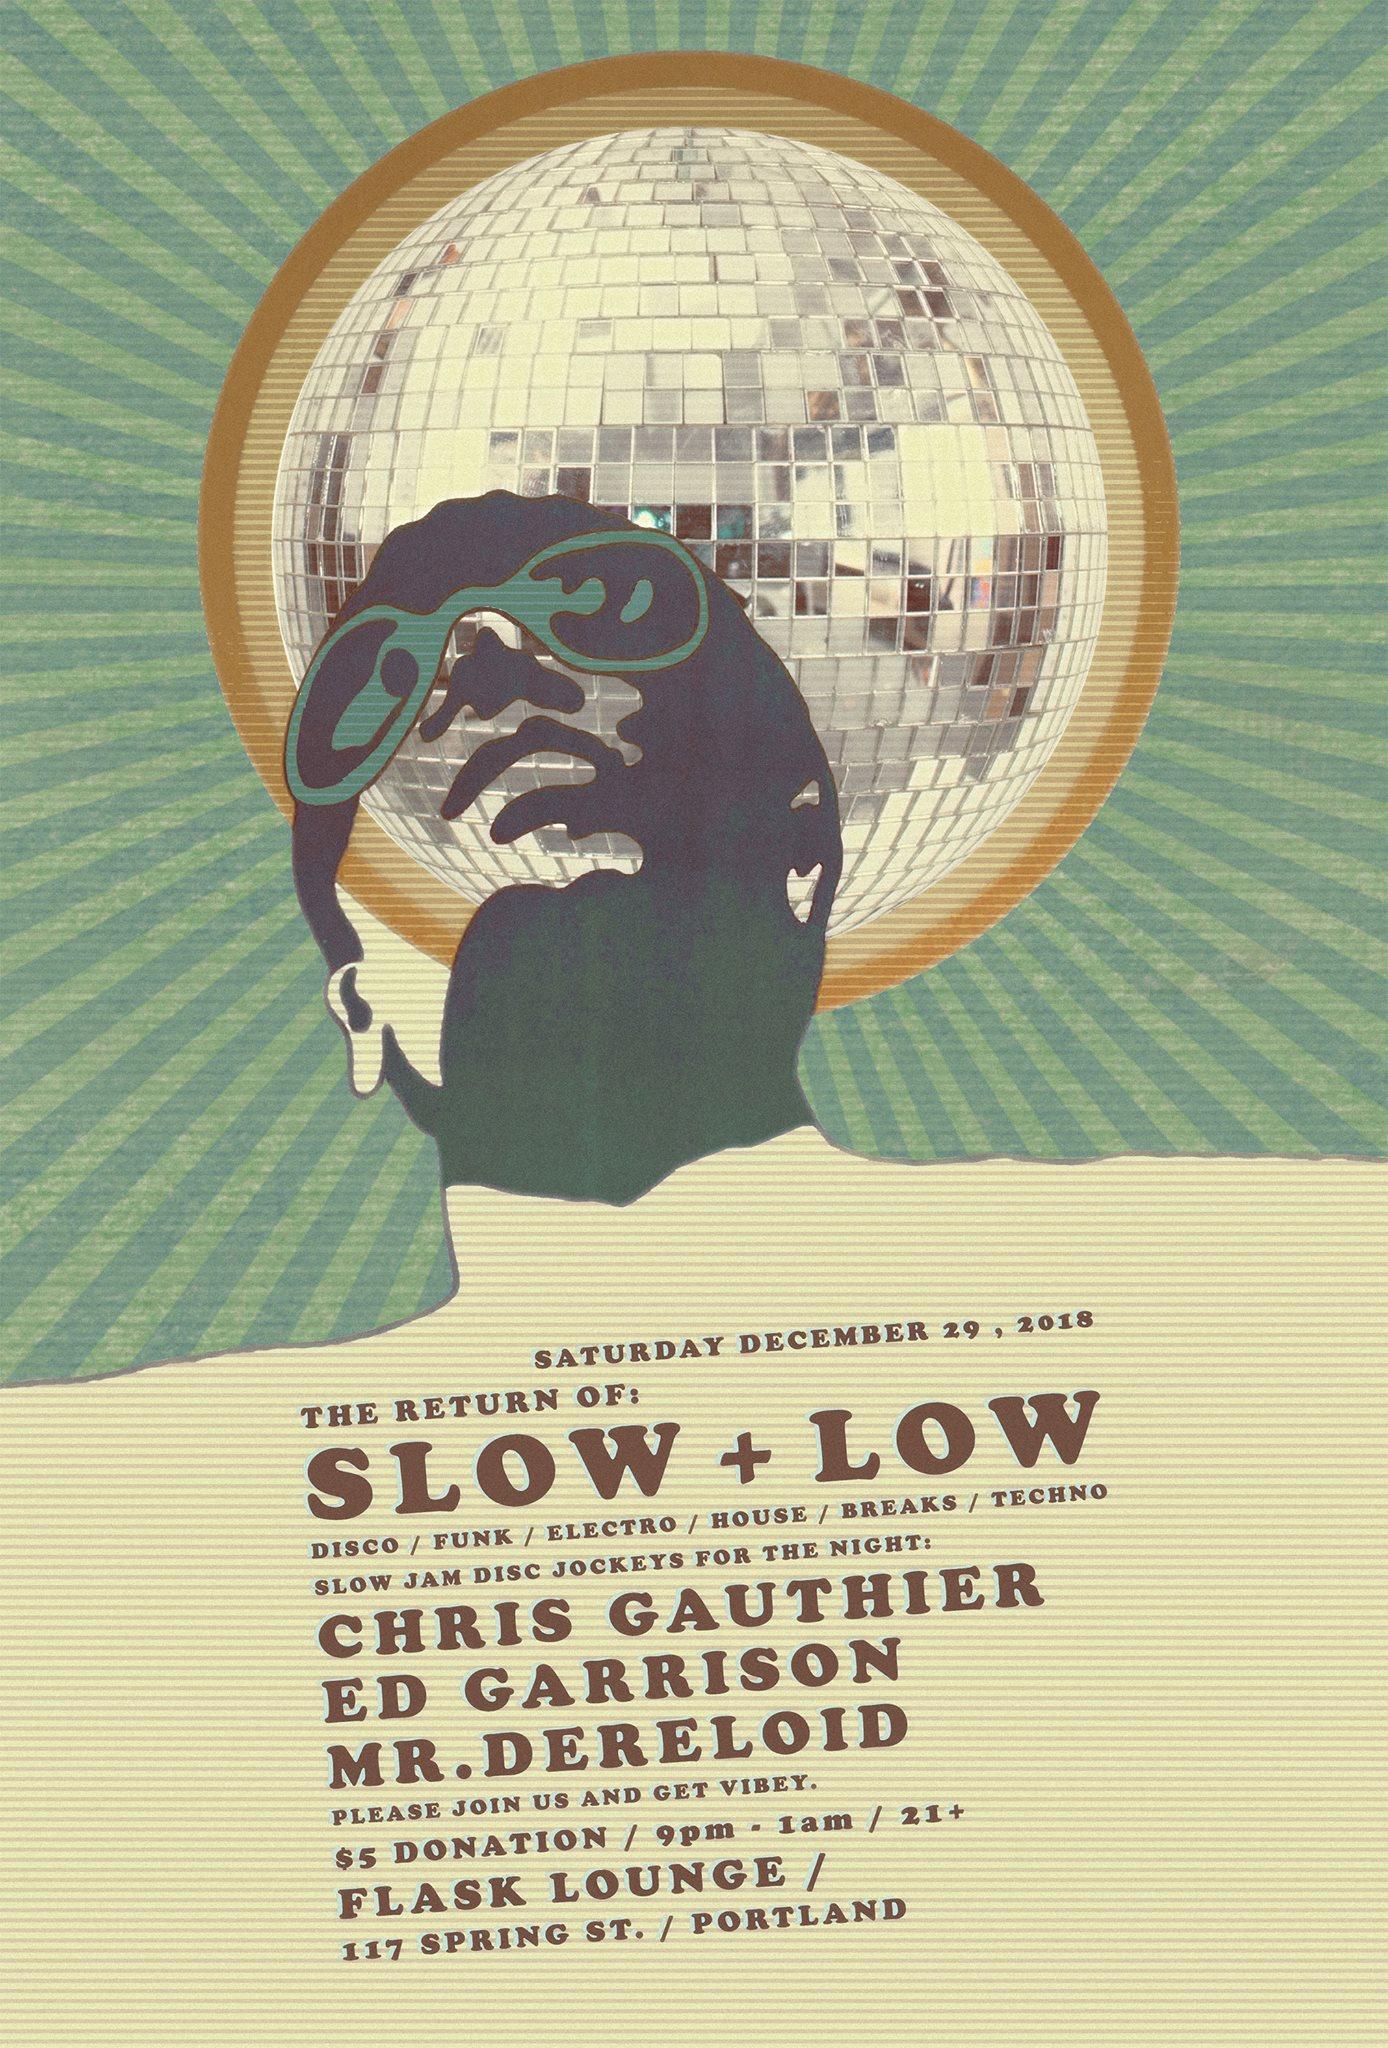 The Return of Slow + Low! - Flask Lounge - Portland, Maine